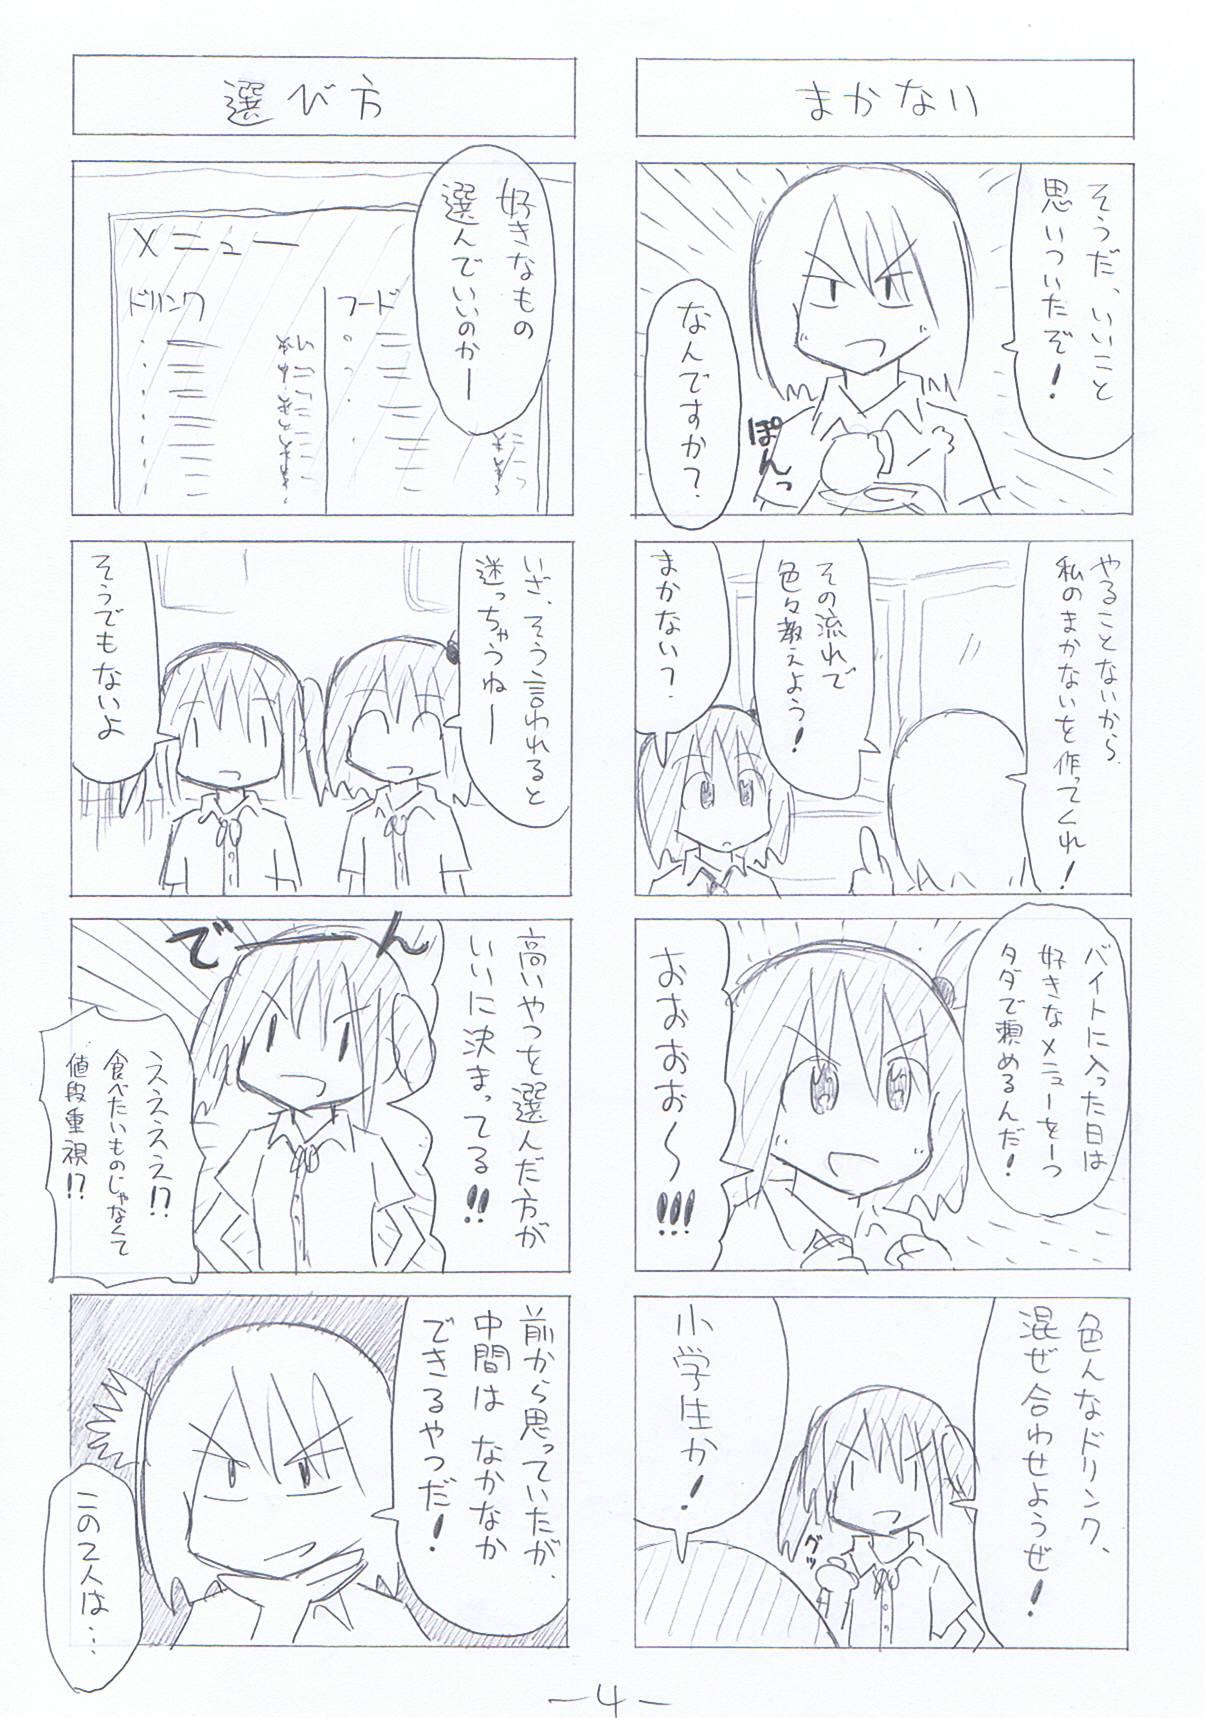 hitotoki-3-4.jpg